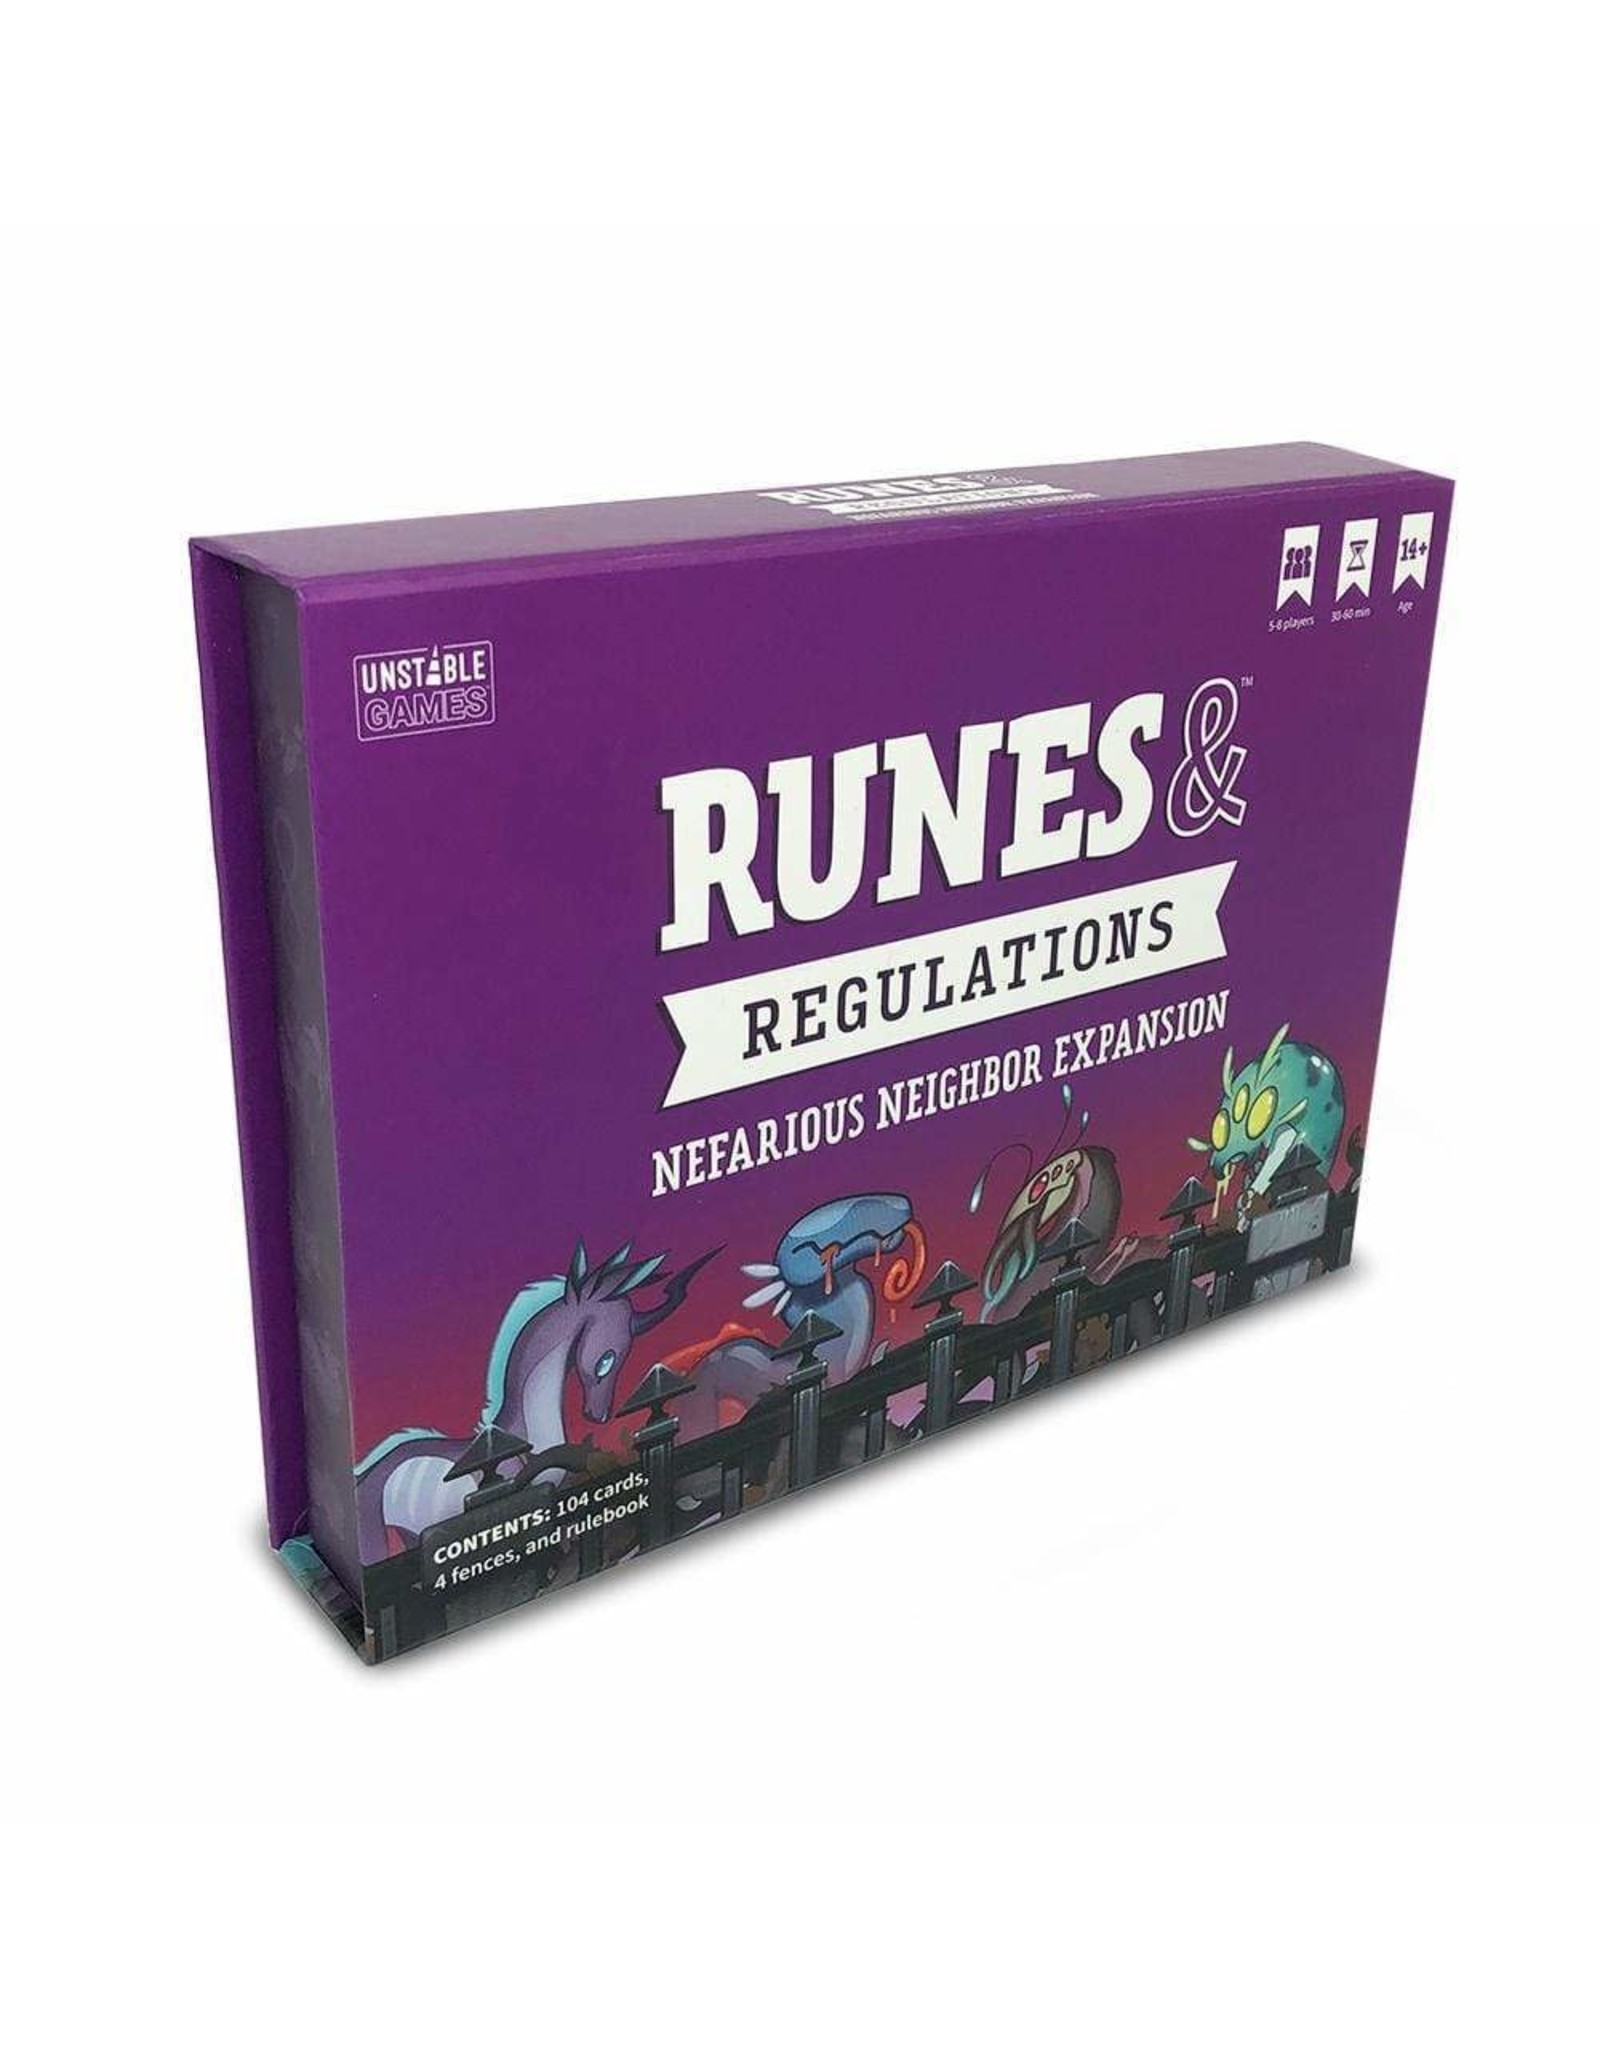 Runes & Regulations: Nefarious Neighbors Expansion